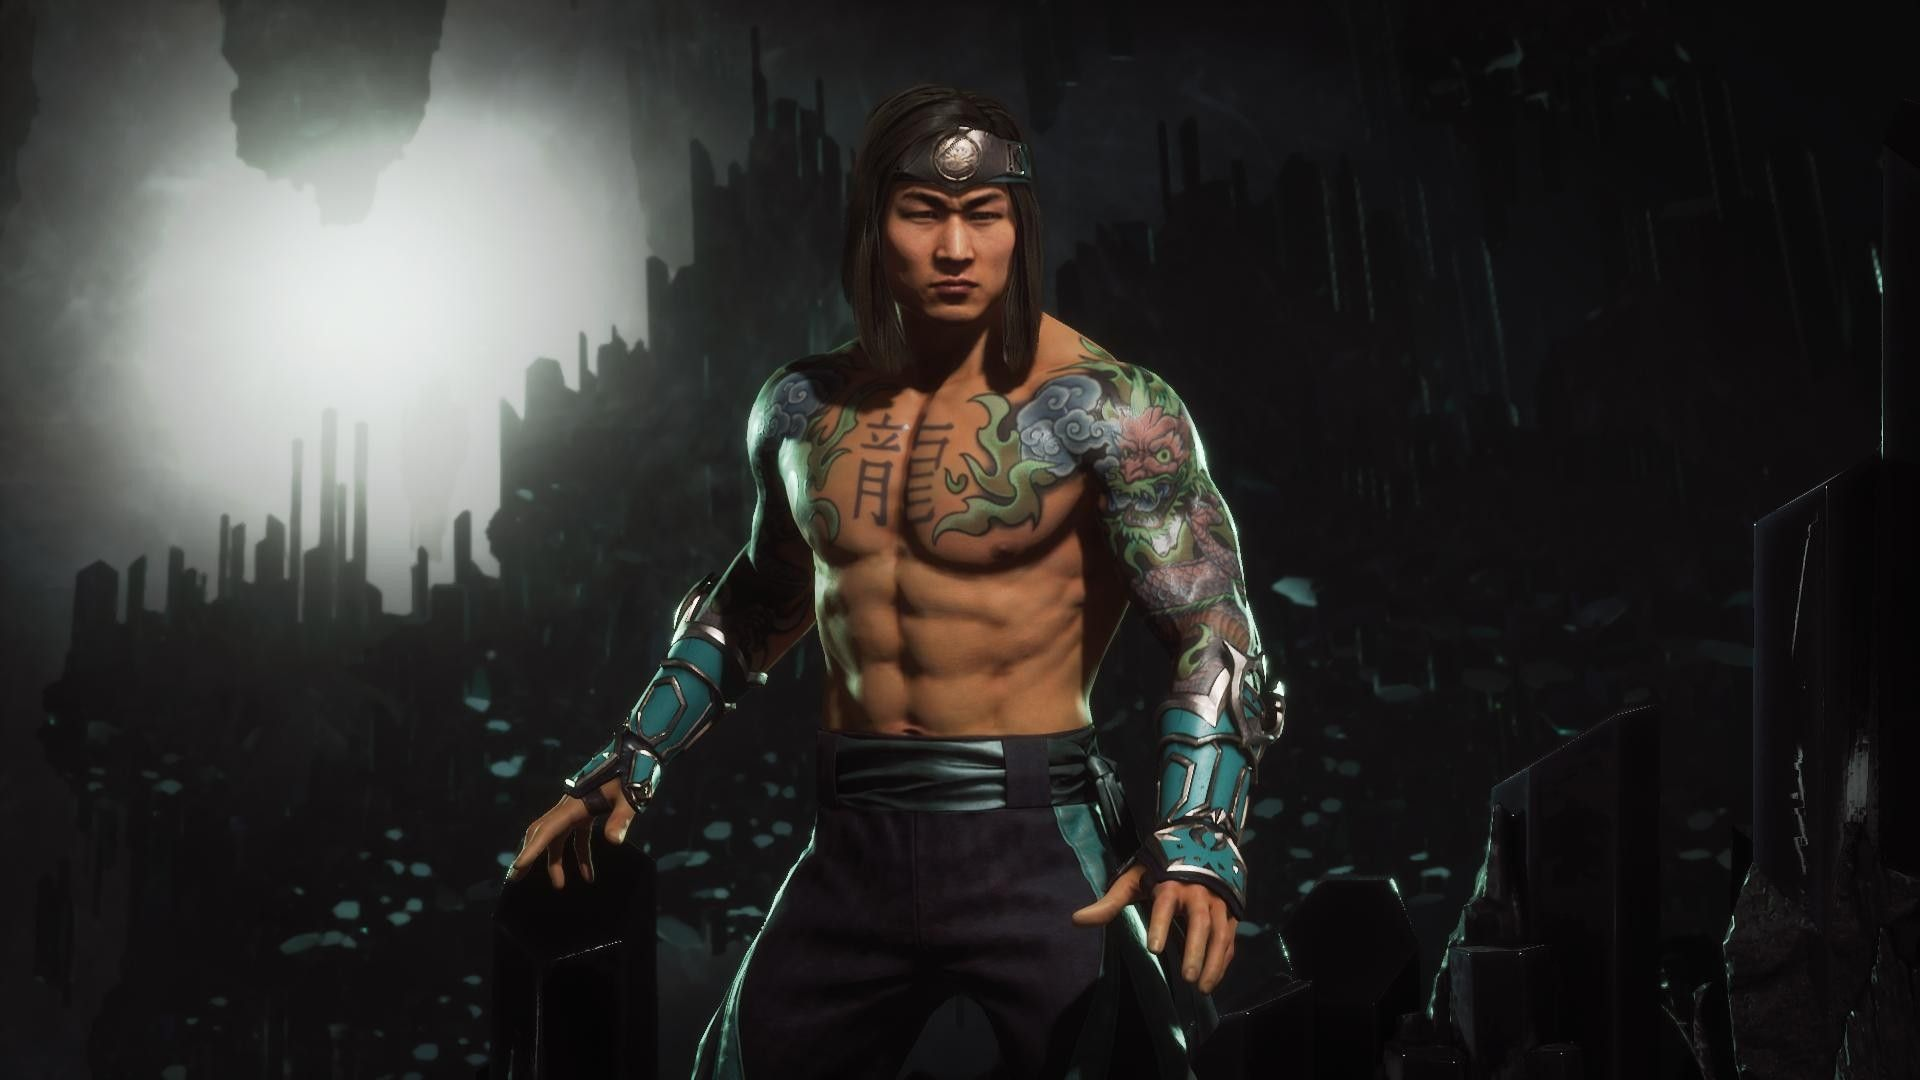 Badass Liu Kang Mortal Kombat Characters Mortal Kombat Mortal Kombat Art